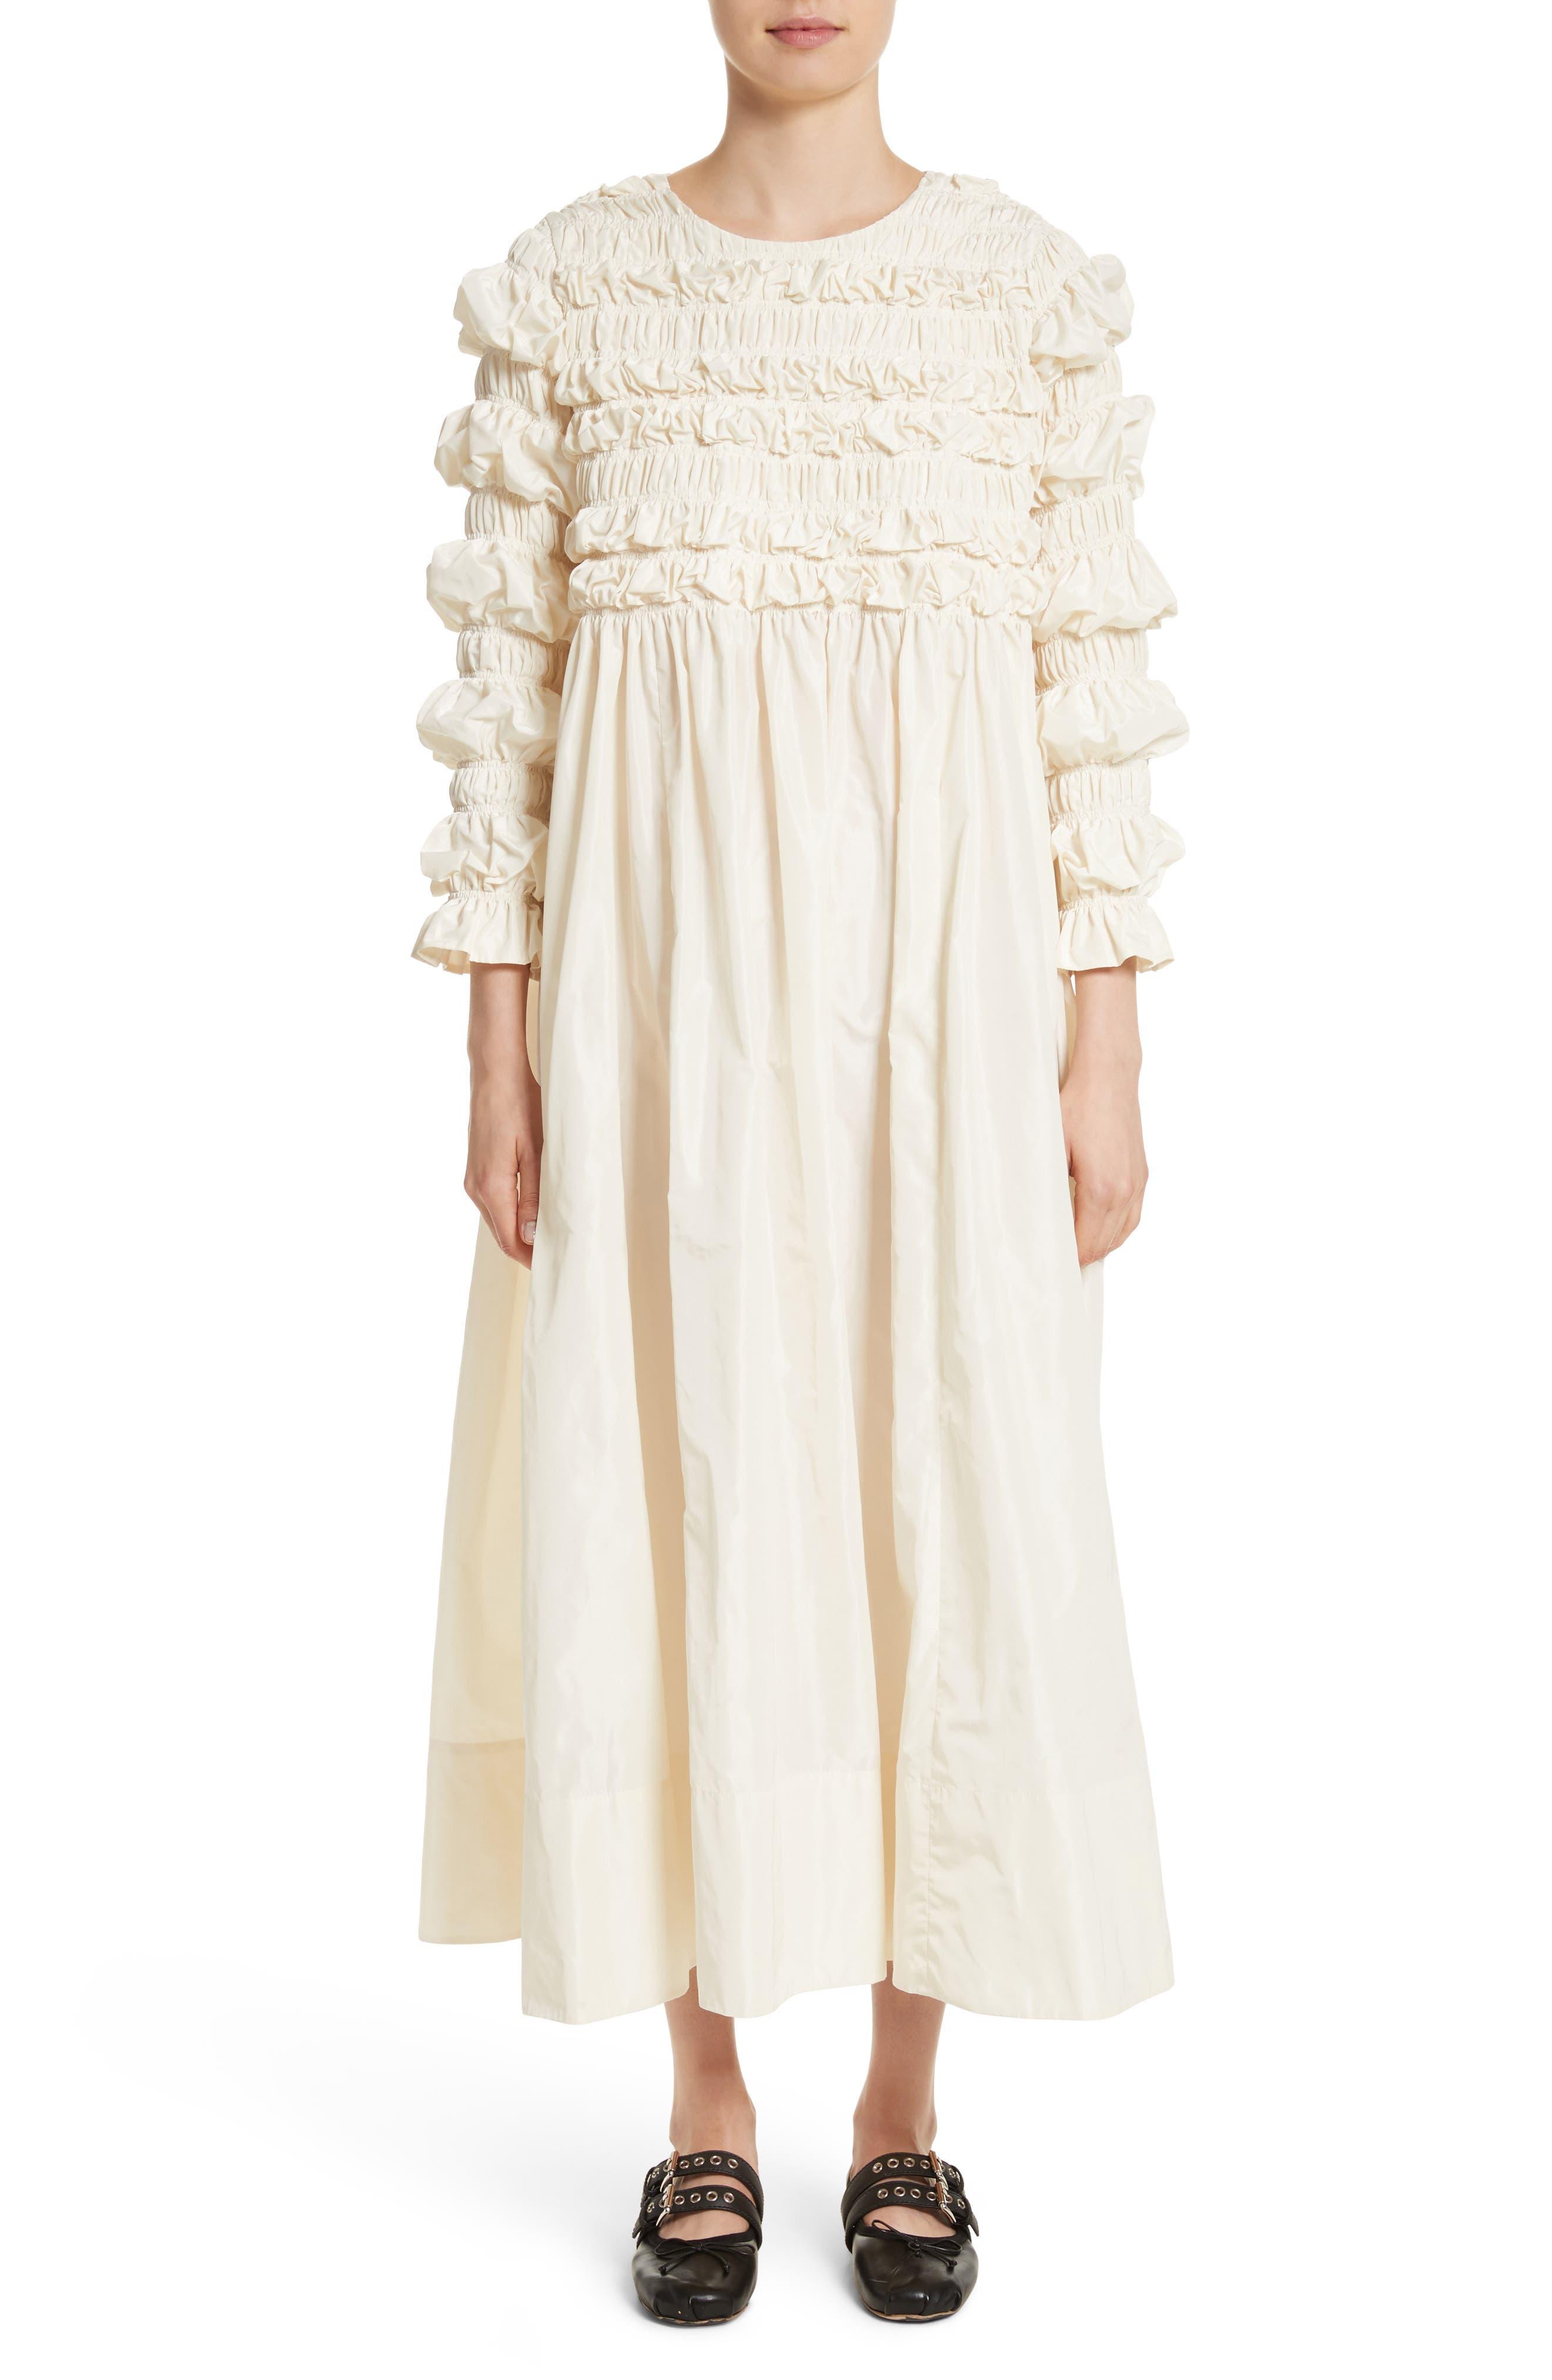 Alternate Image 1 Selected - Molly Goddard Lizzie Ruffled Taffeta Dress